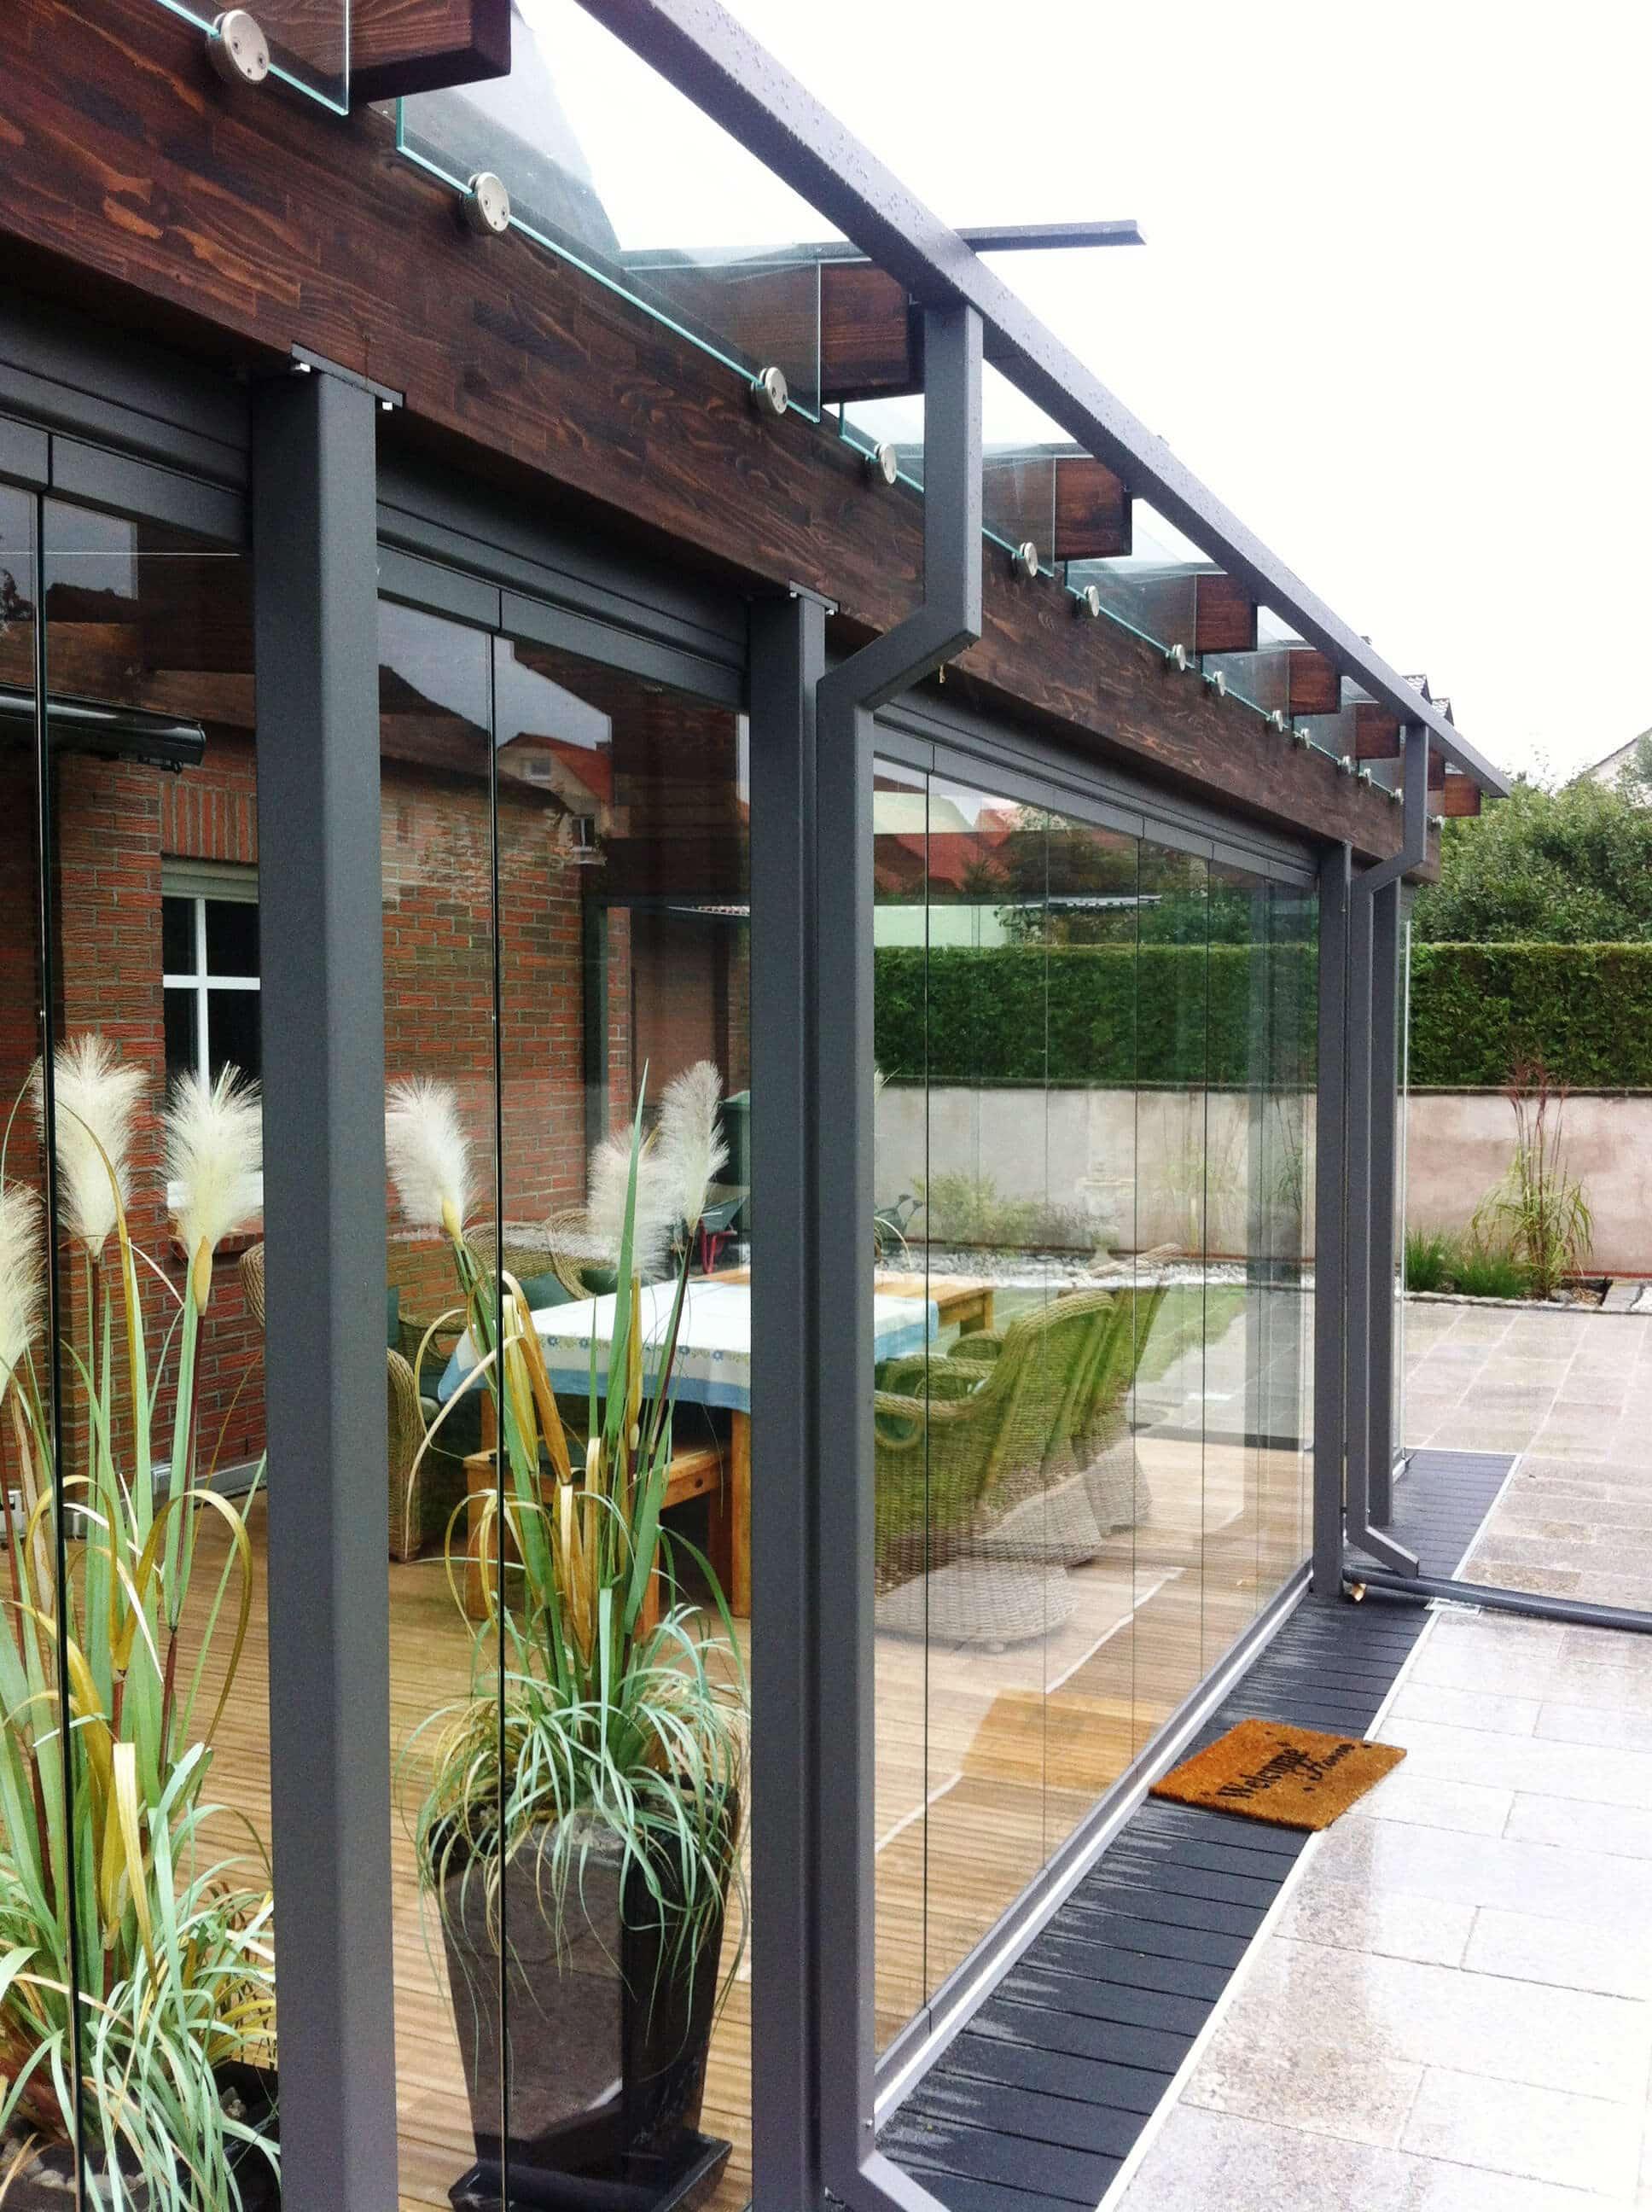 Wintergarten mit transparenten Türen